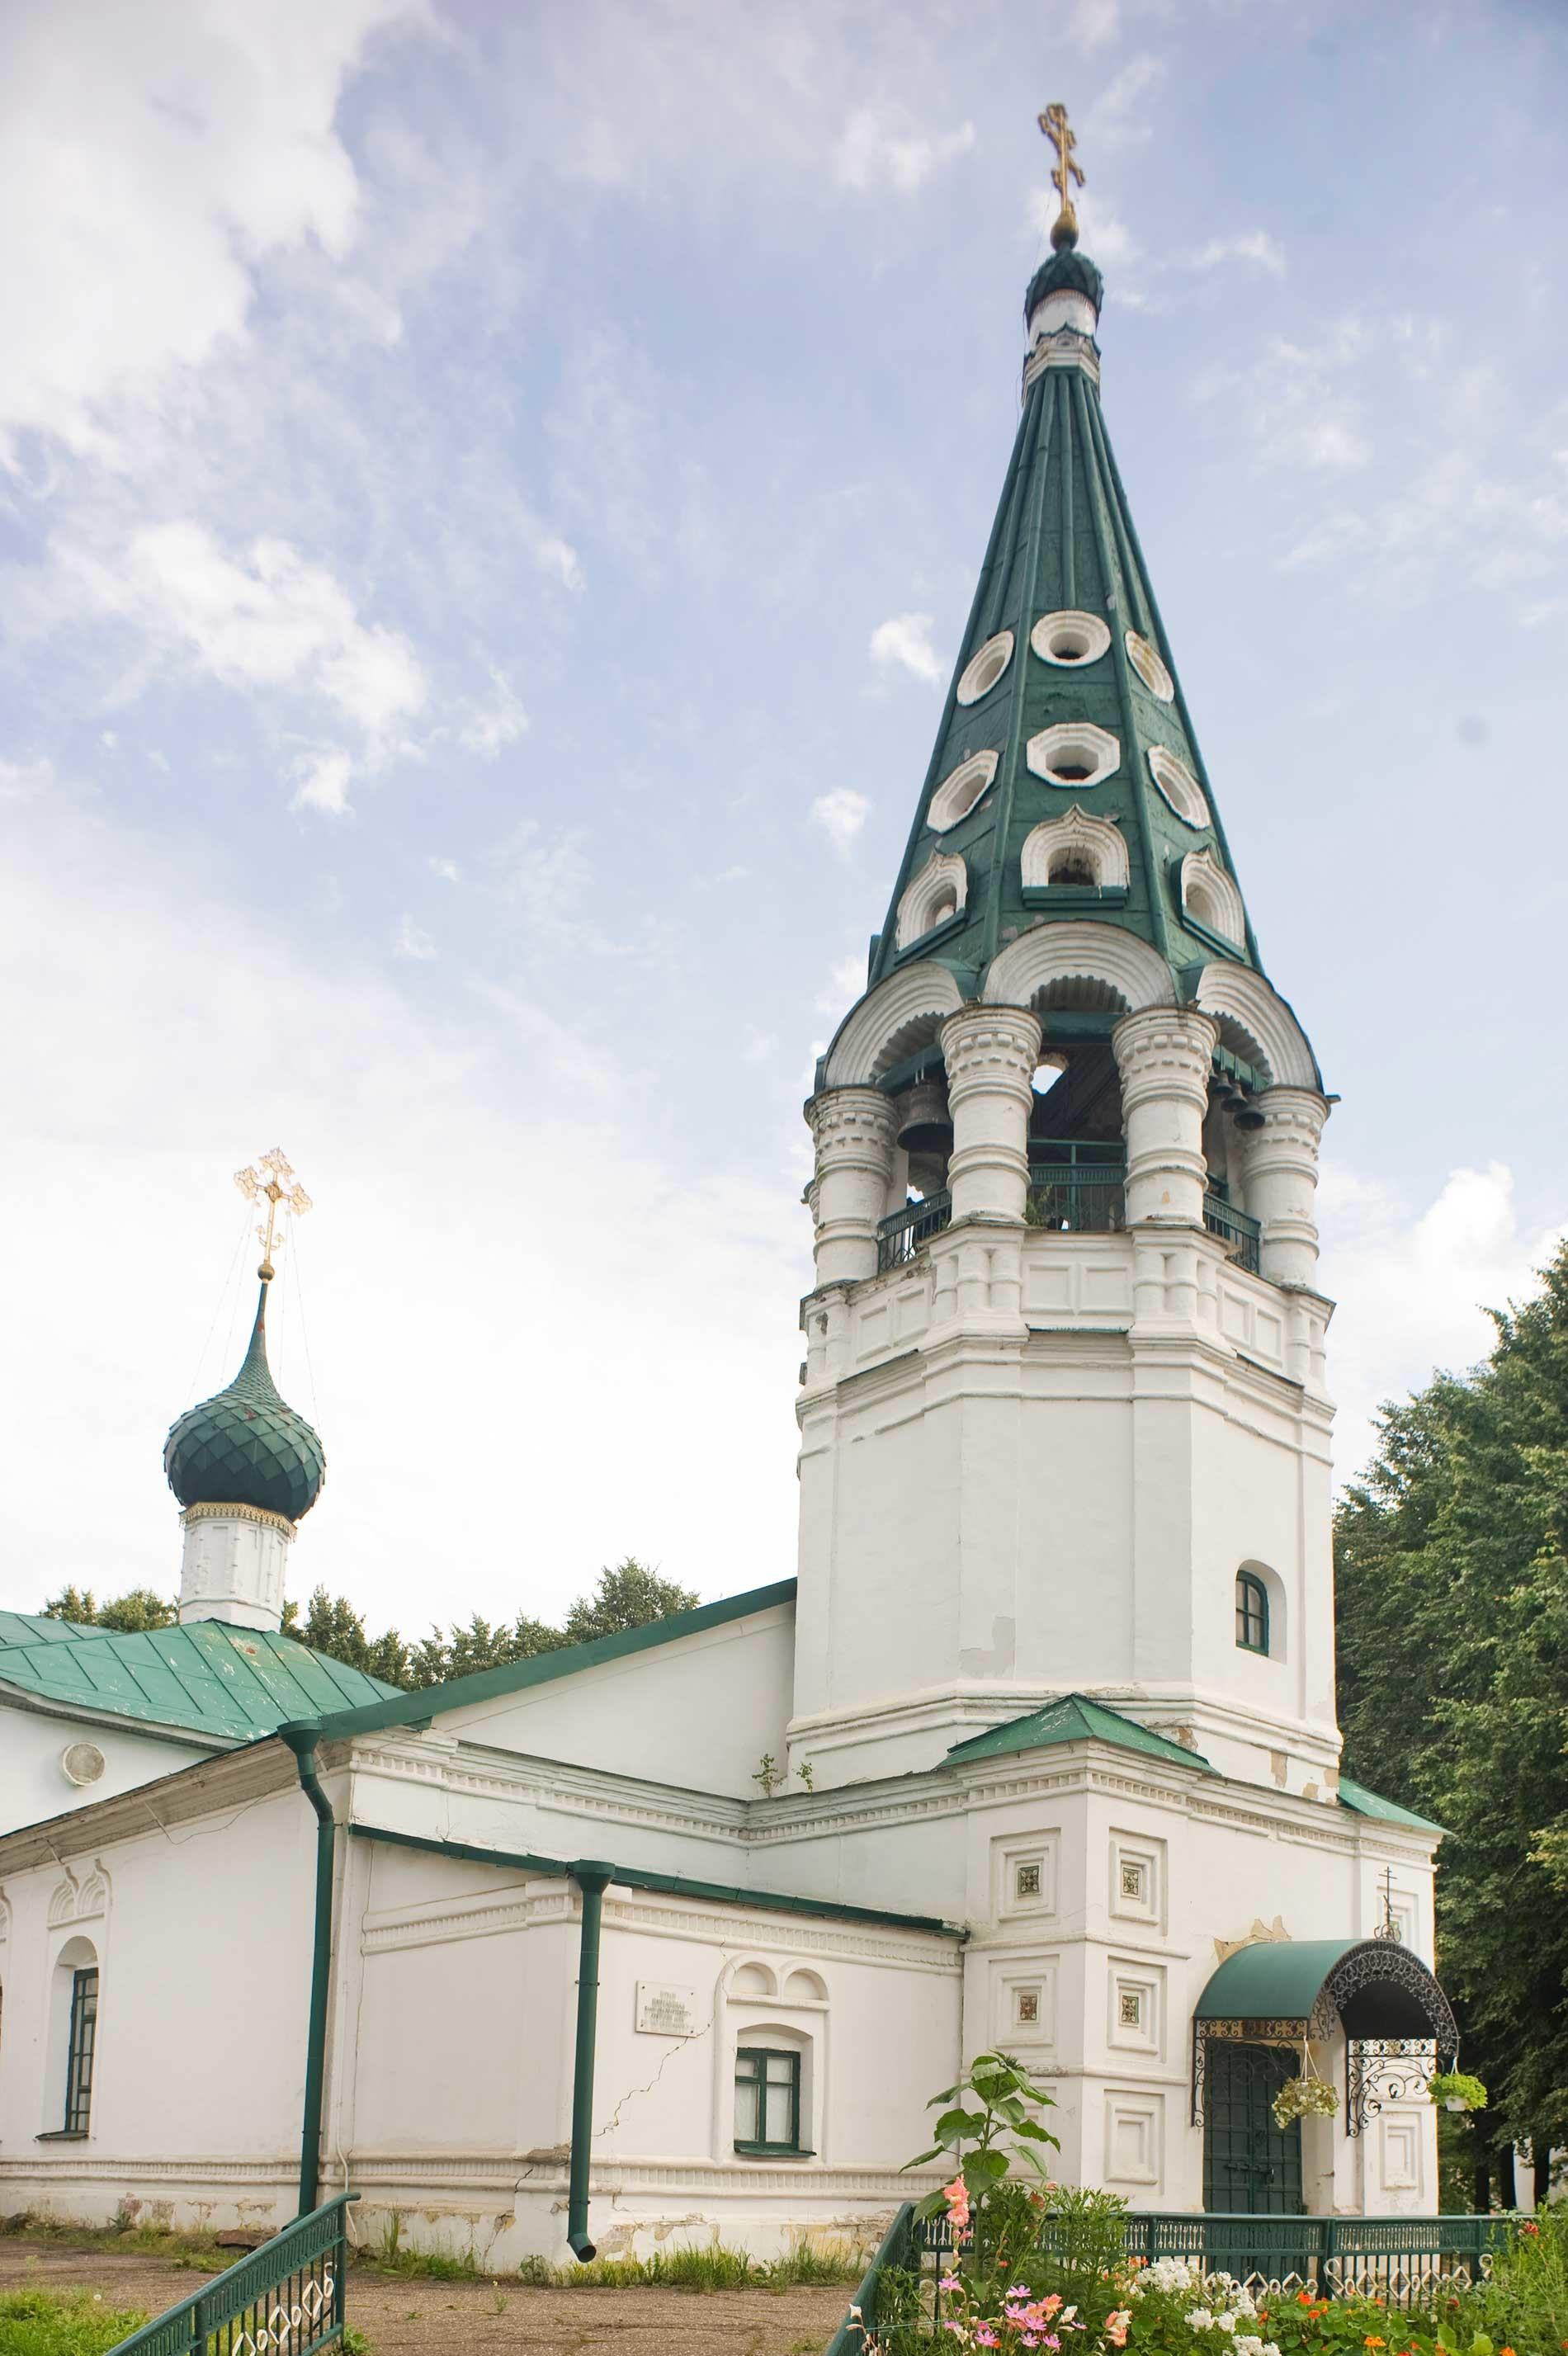 Church of St. Nicholas. Northwest view. August 14, 2017.